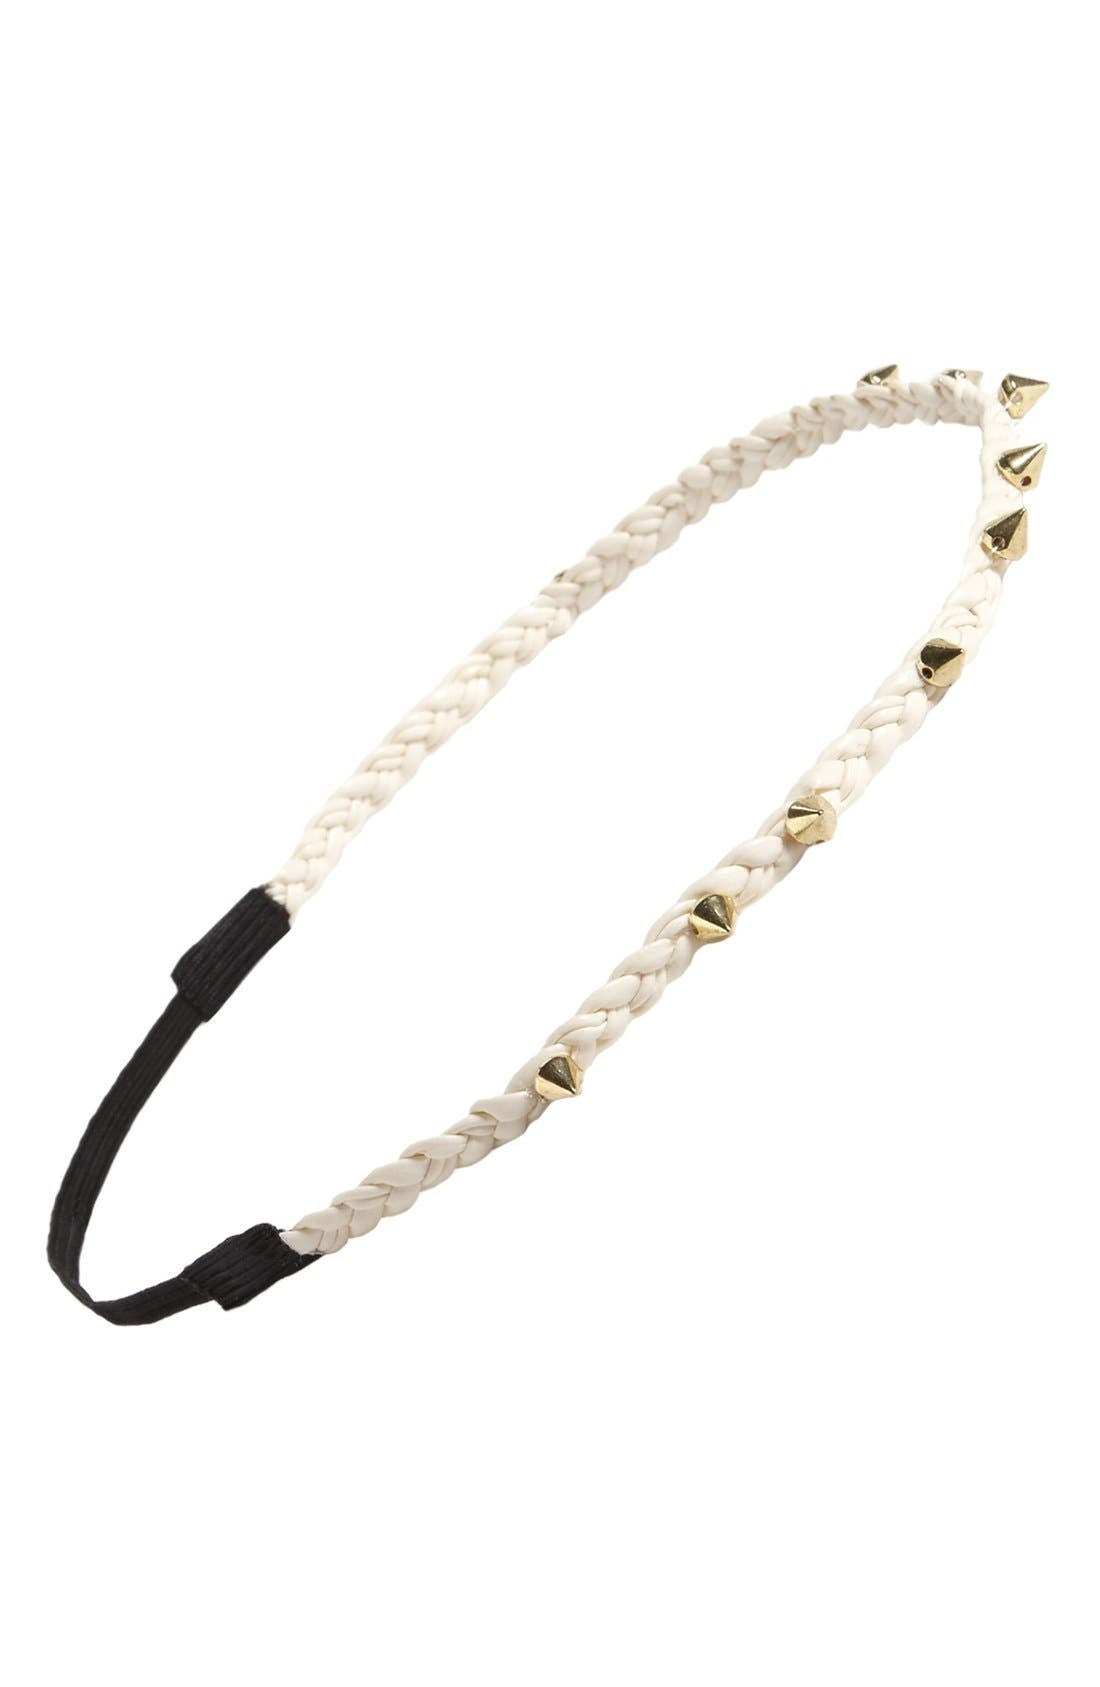 Main Image - Stephan & Co. Studded Rope Braid Headband